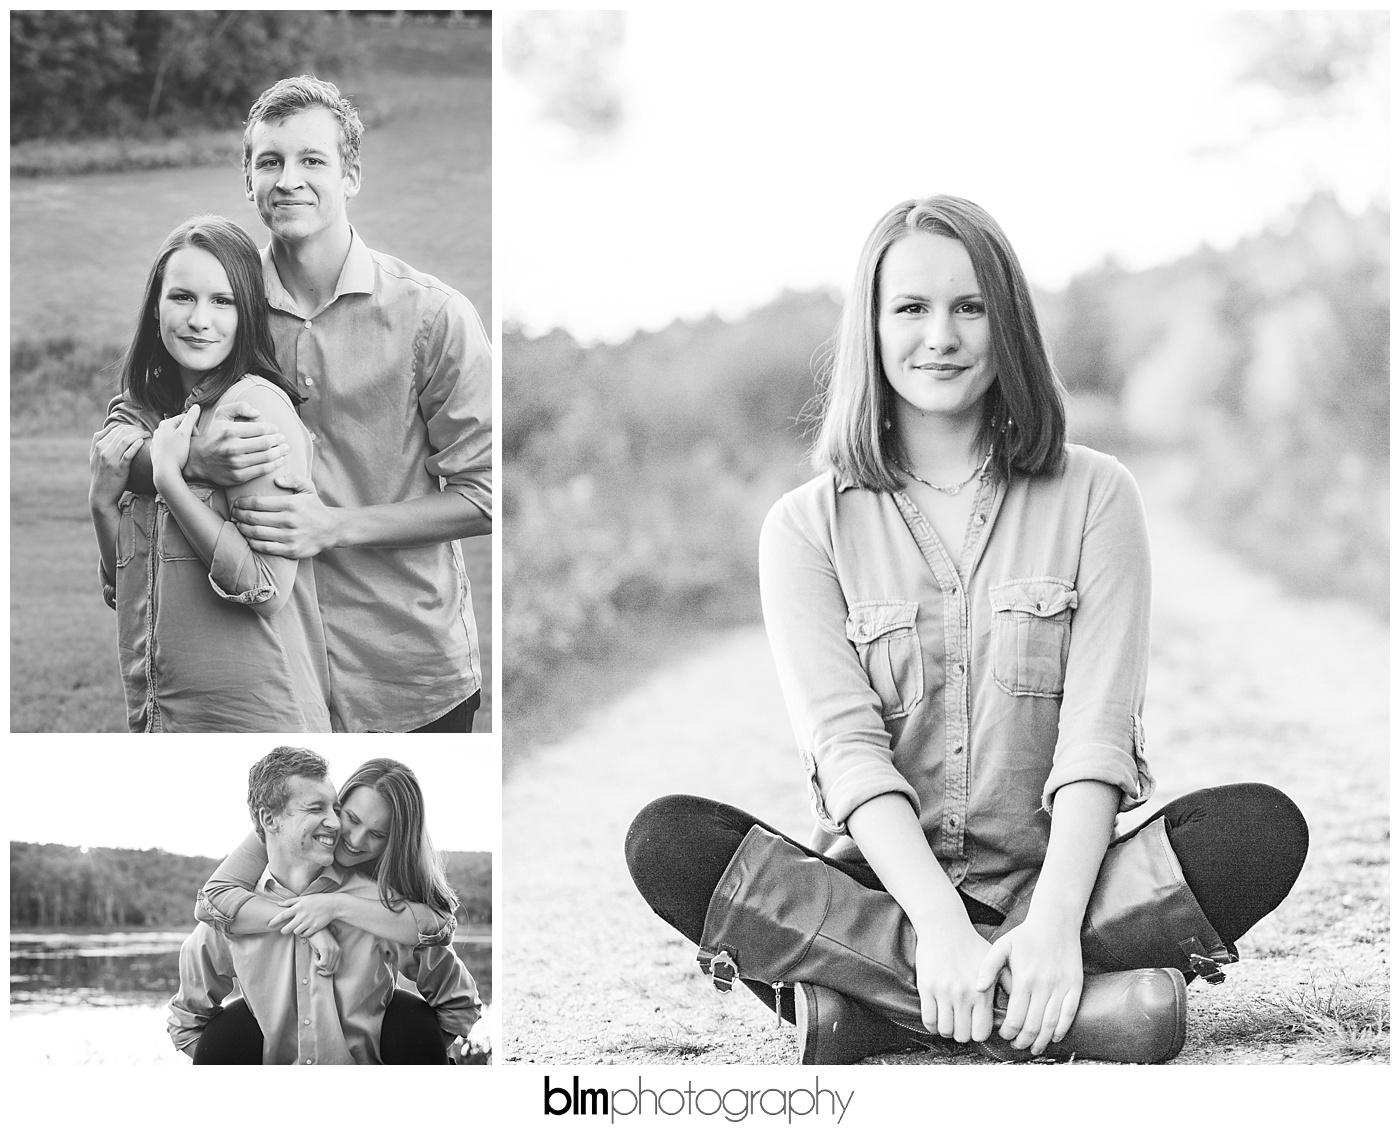 Isaac-and-Gwen_Senior-Portraits_091516-3285-2.jpg